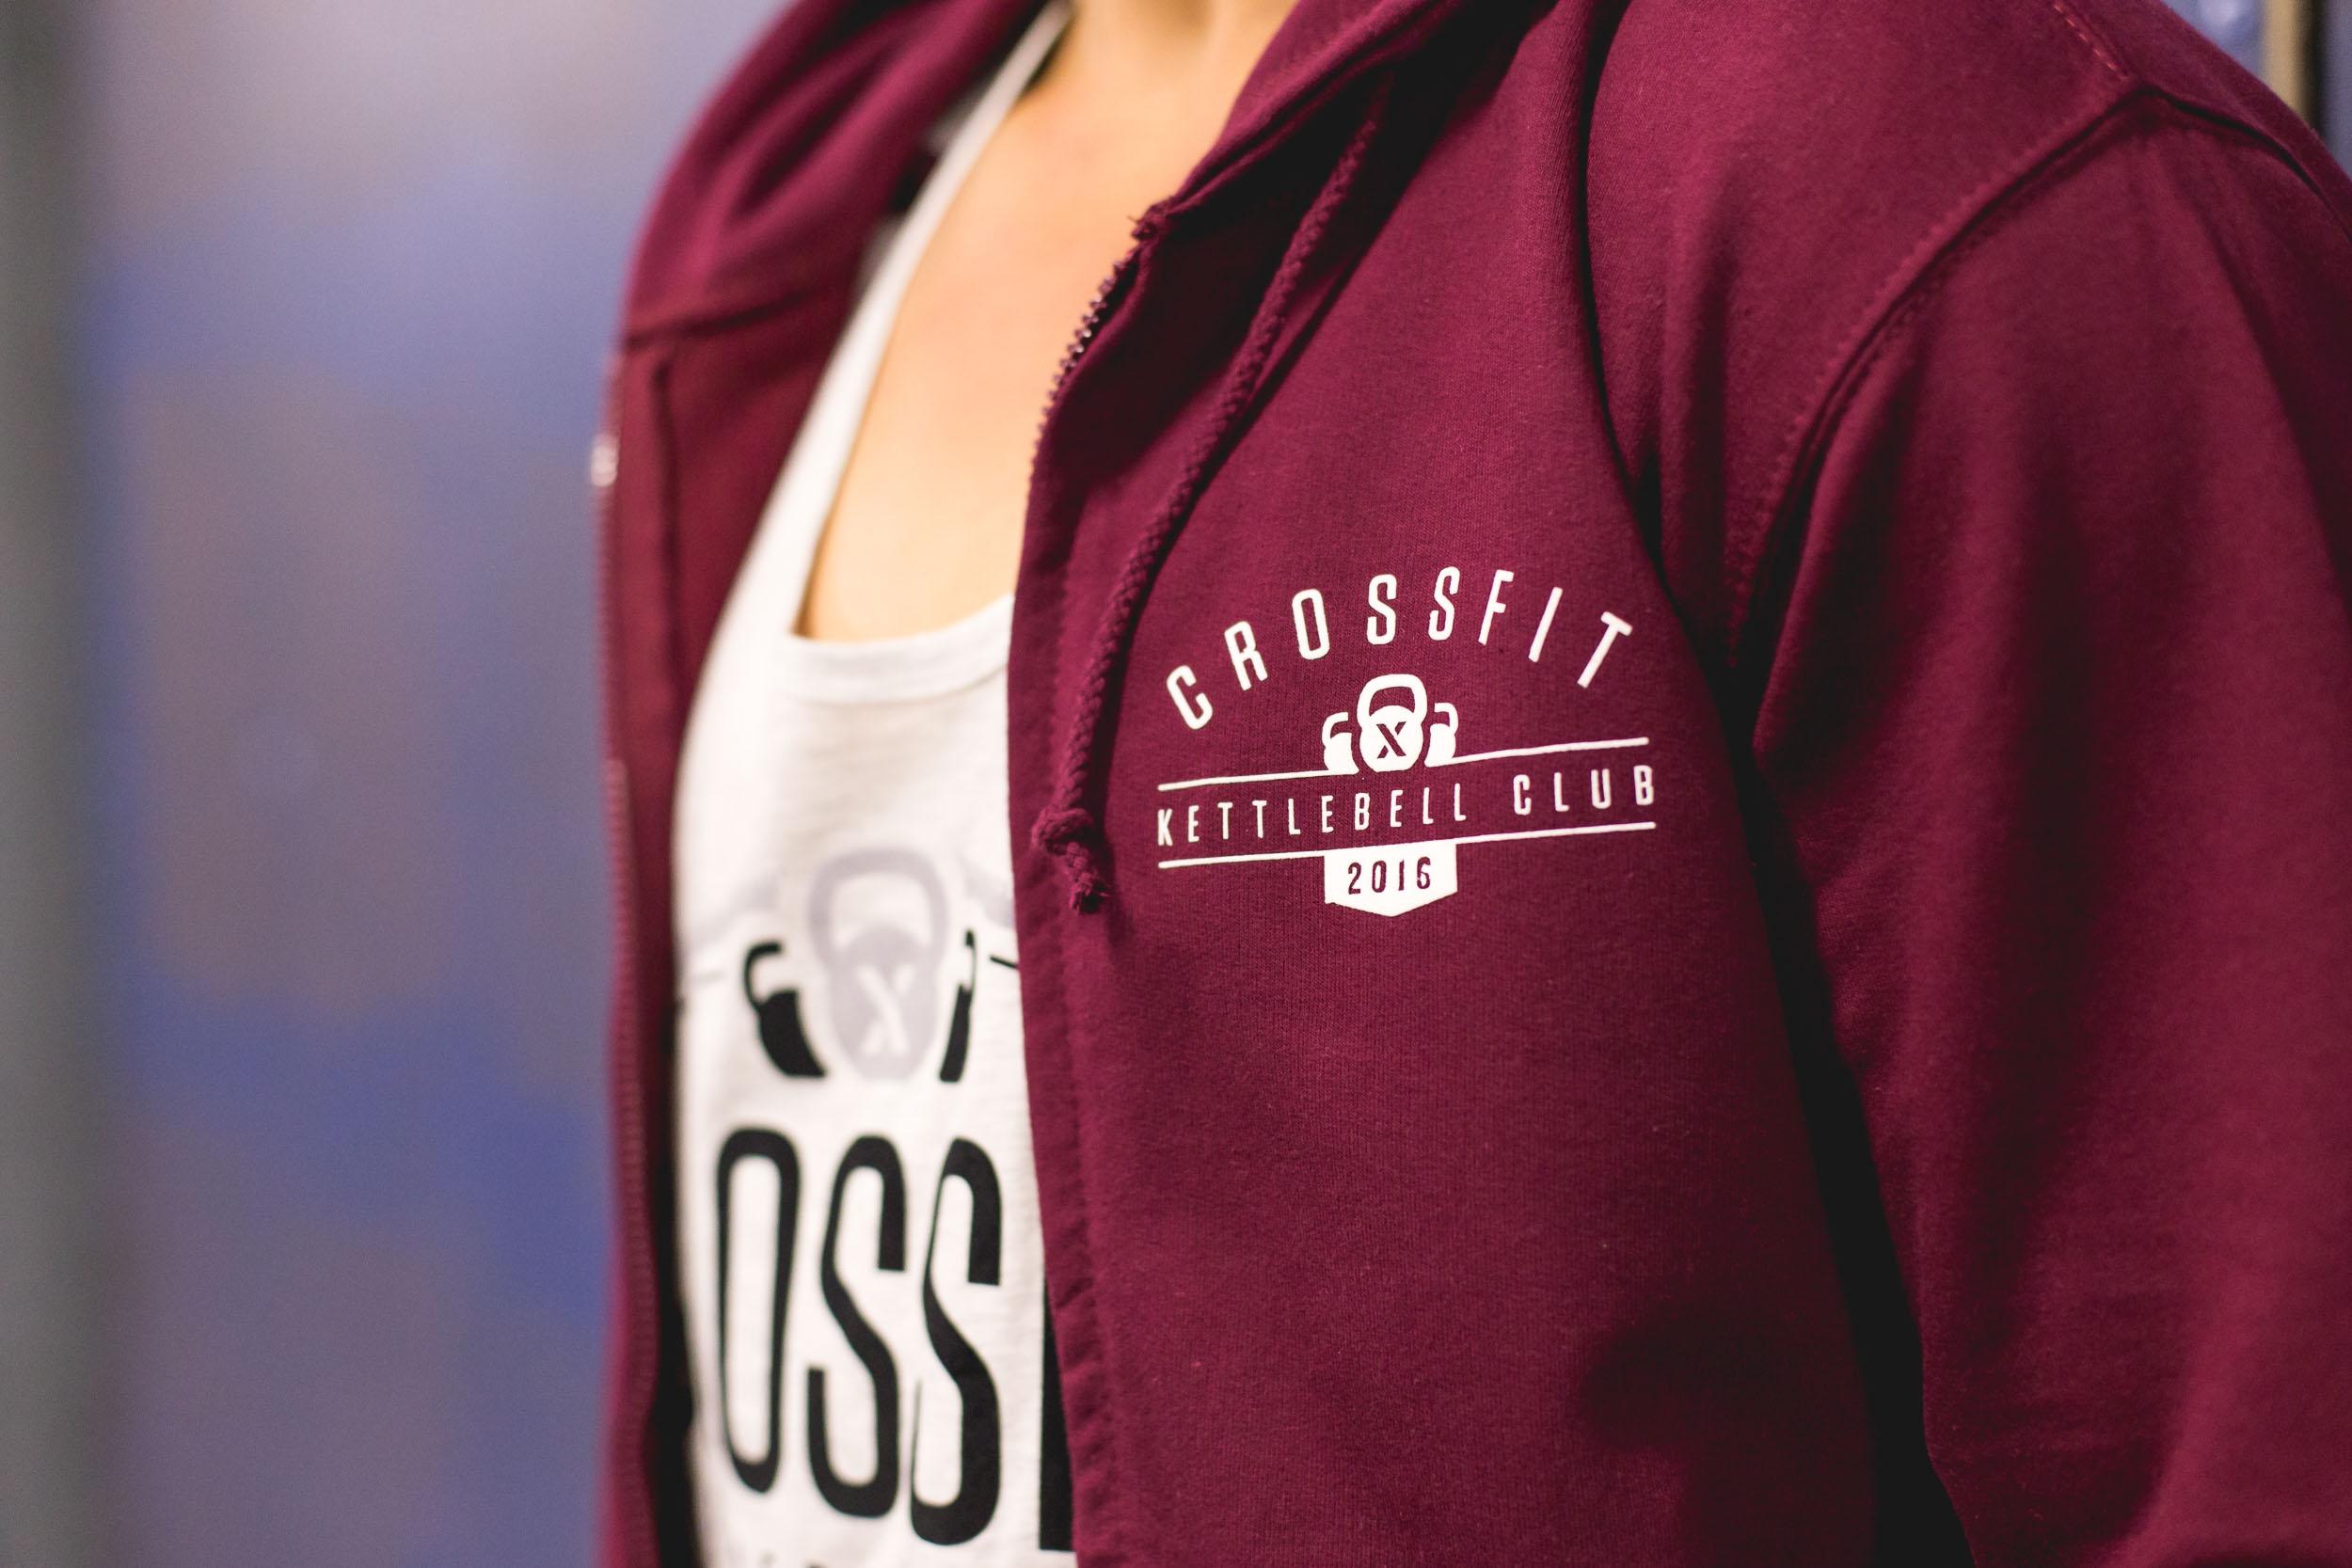 Crossfit UK printed clothing t-shirts-9678.jpg